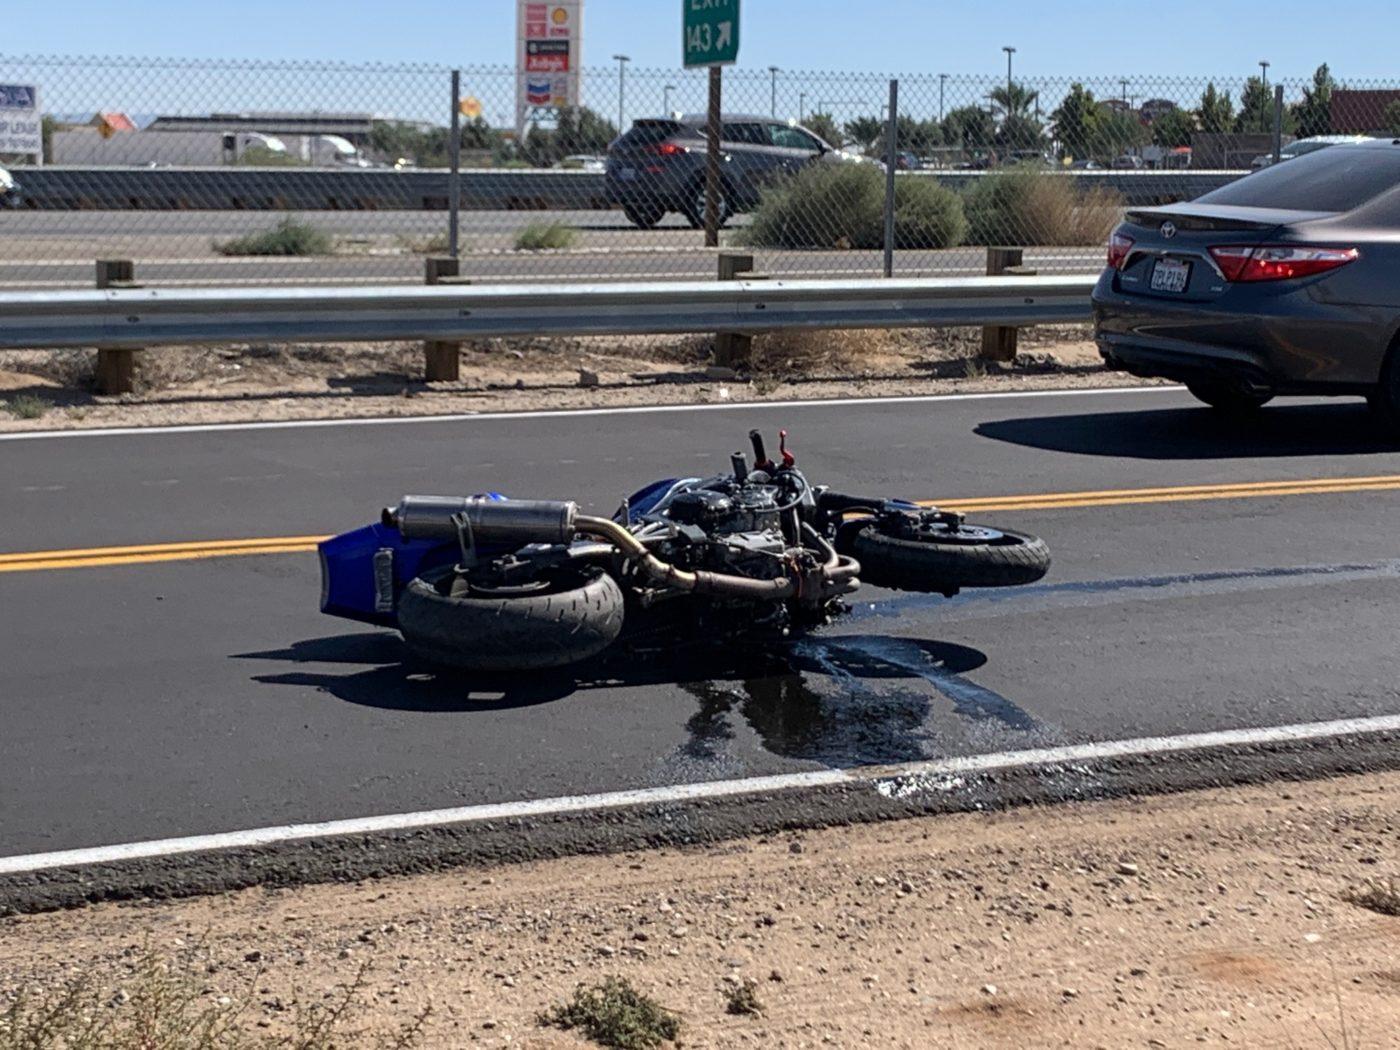 motorcycle rider injured in crash on Hesperia Road